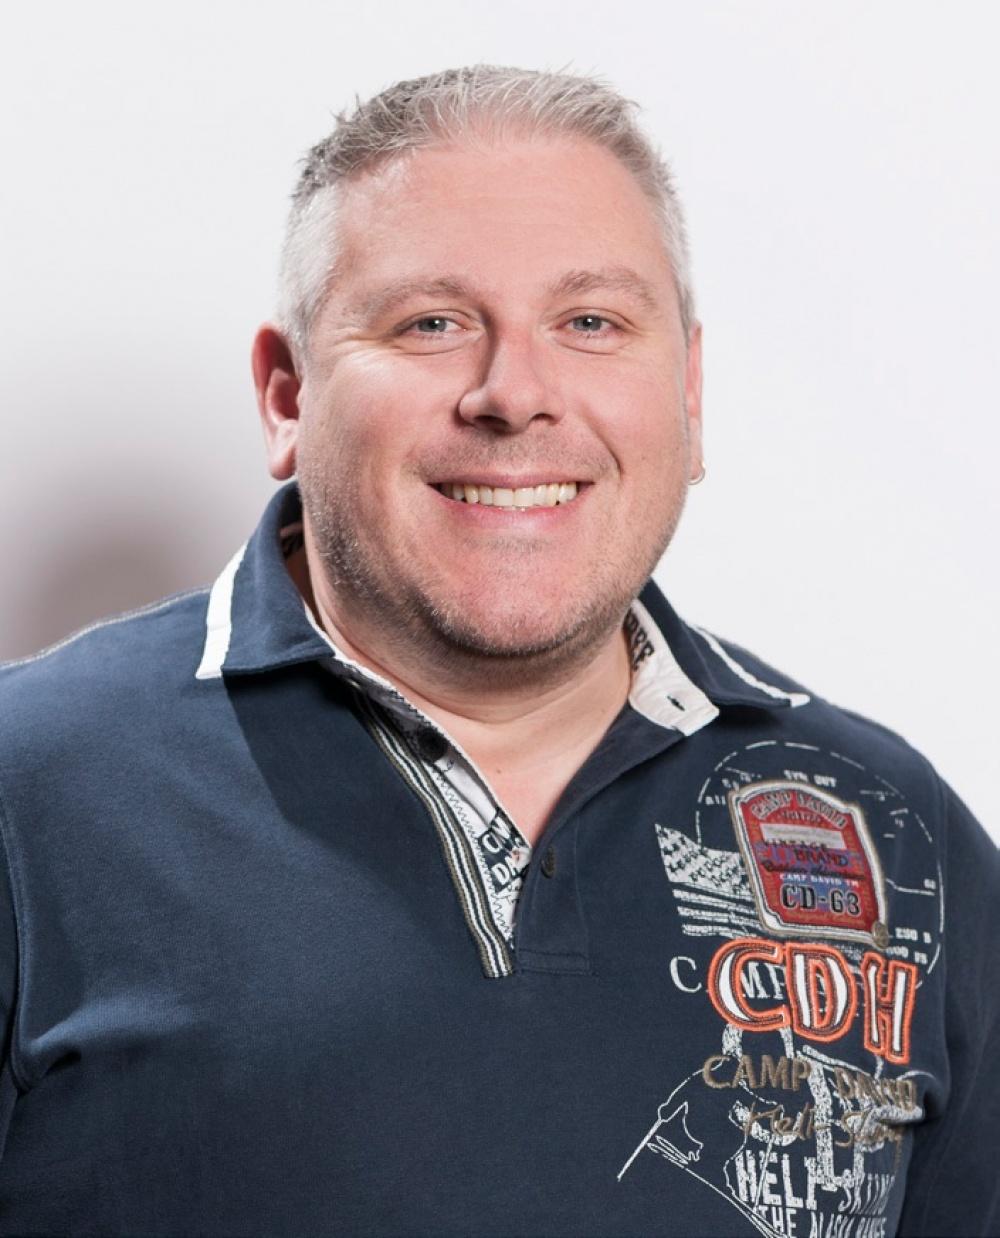 Michael Schaub